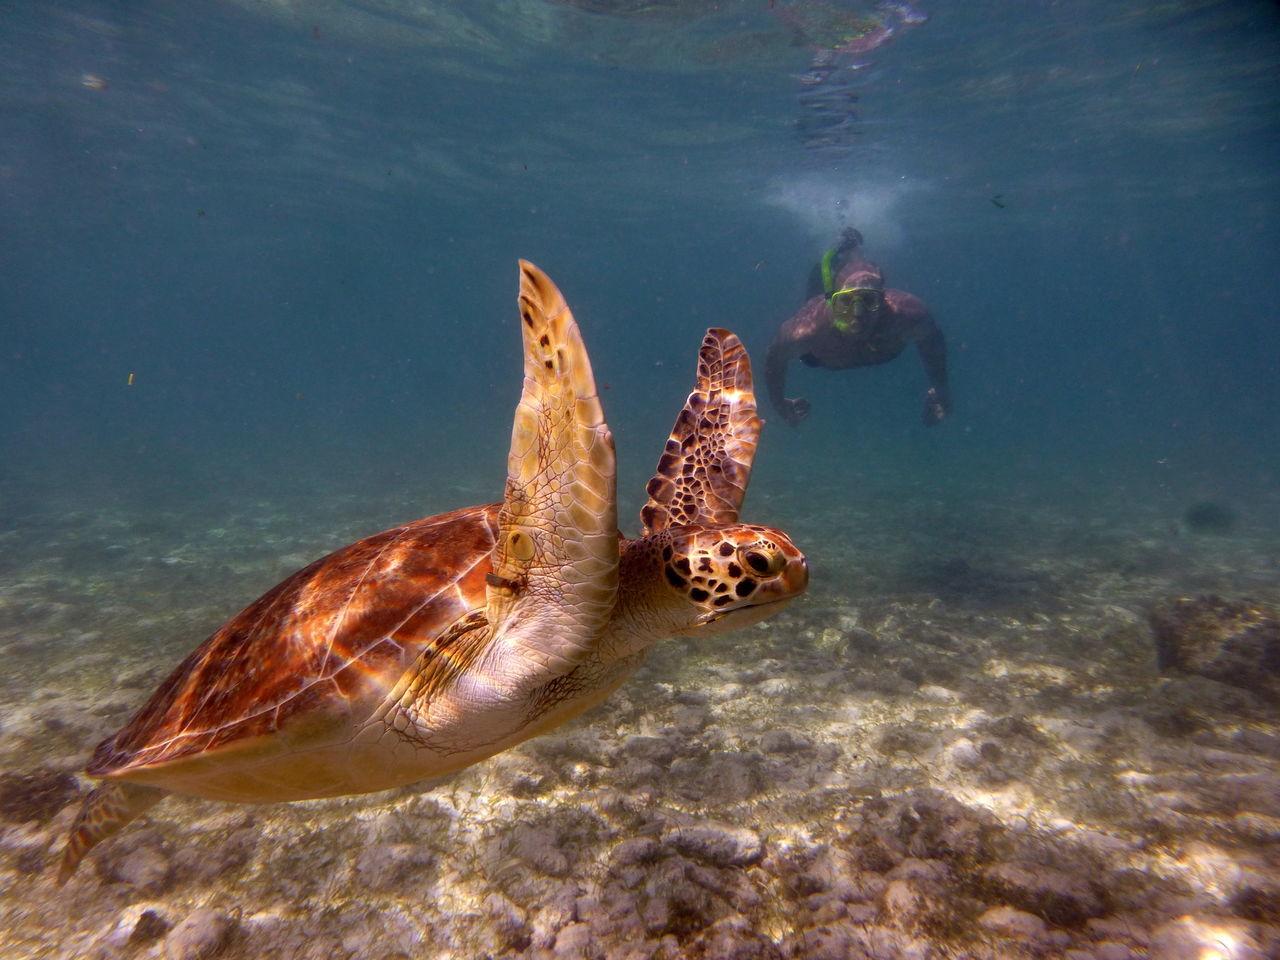 Turtle at Spotts beach Wildlifephotography Wildlife & Nature Animal Love Caribbean Cayman Caymanislands Outdoors Vacations Hawksbill Turtle Underwater Photography Turtle Spotts Beach